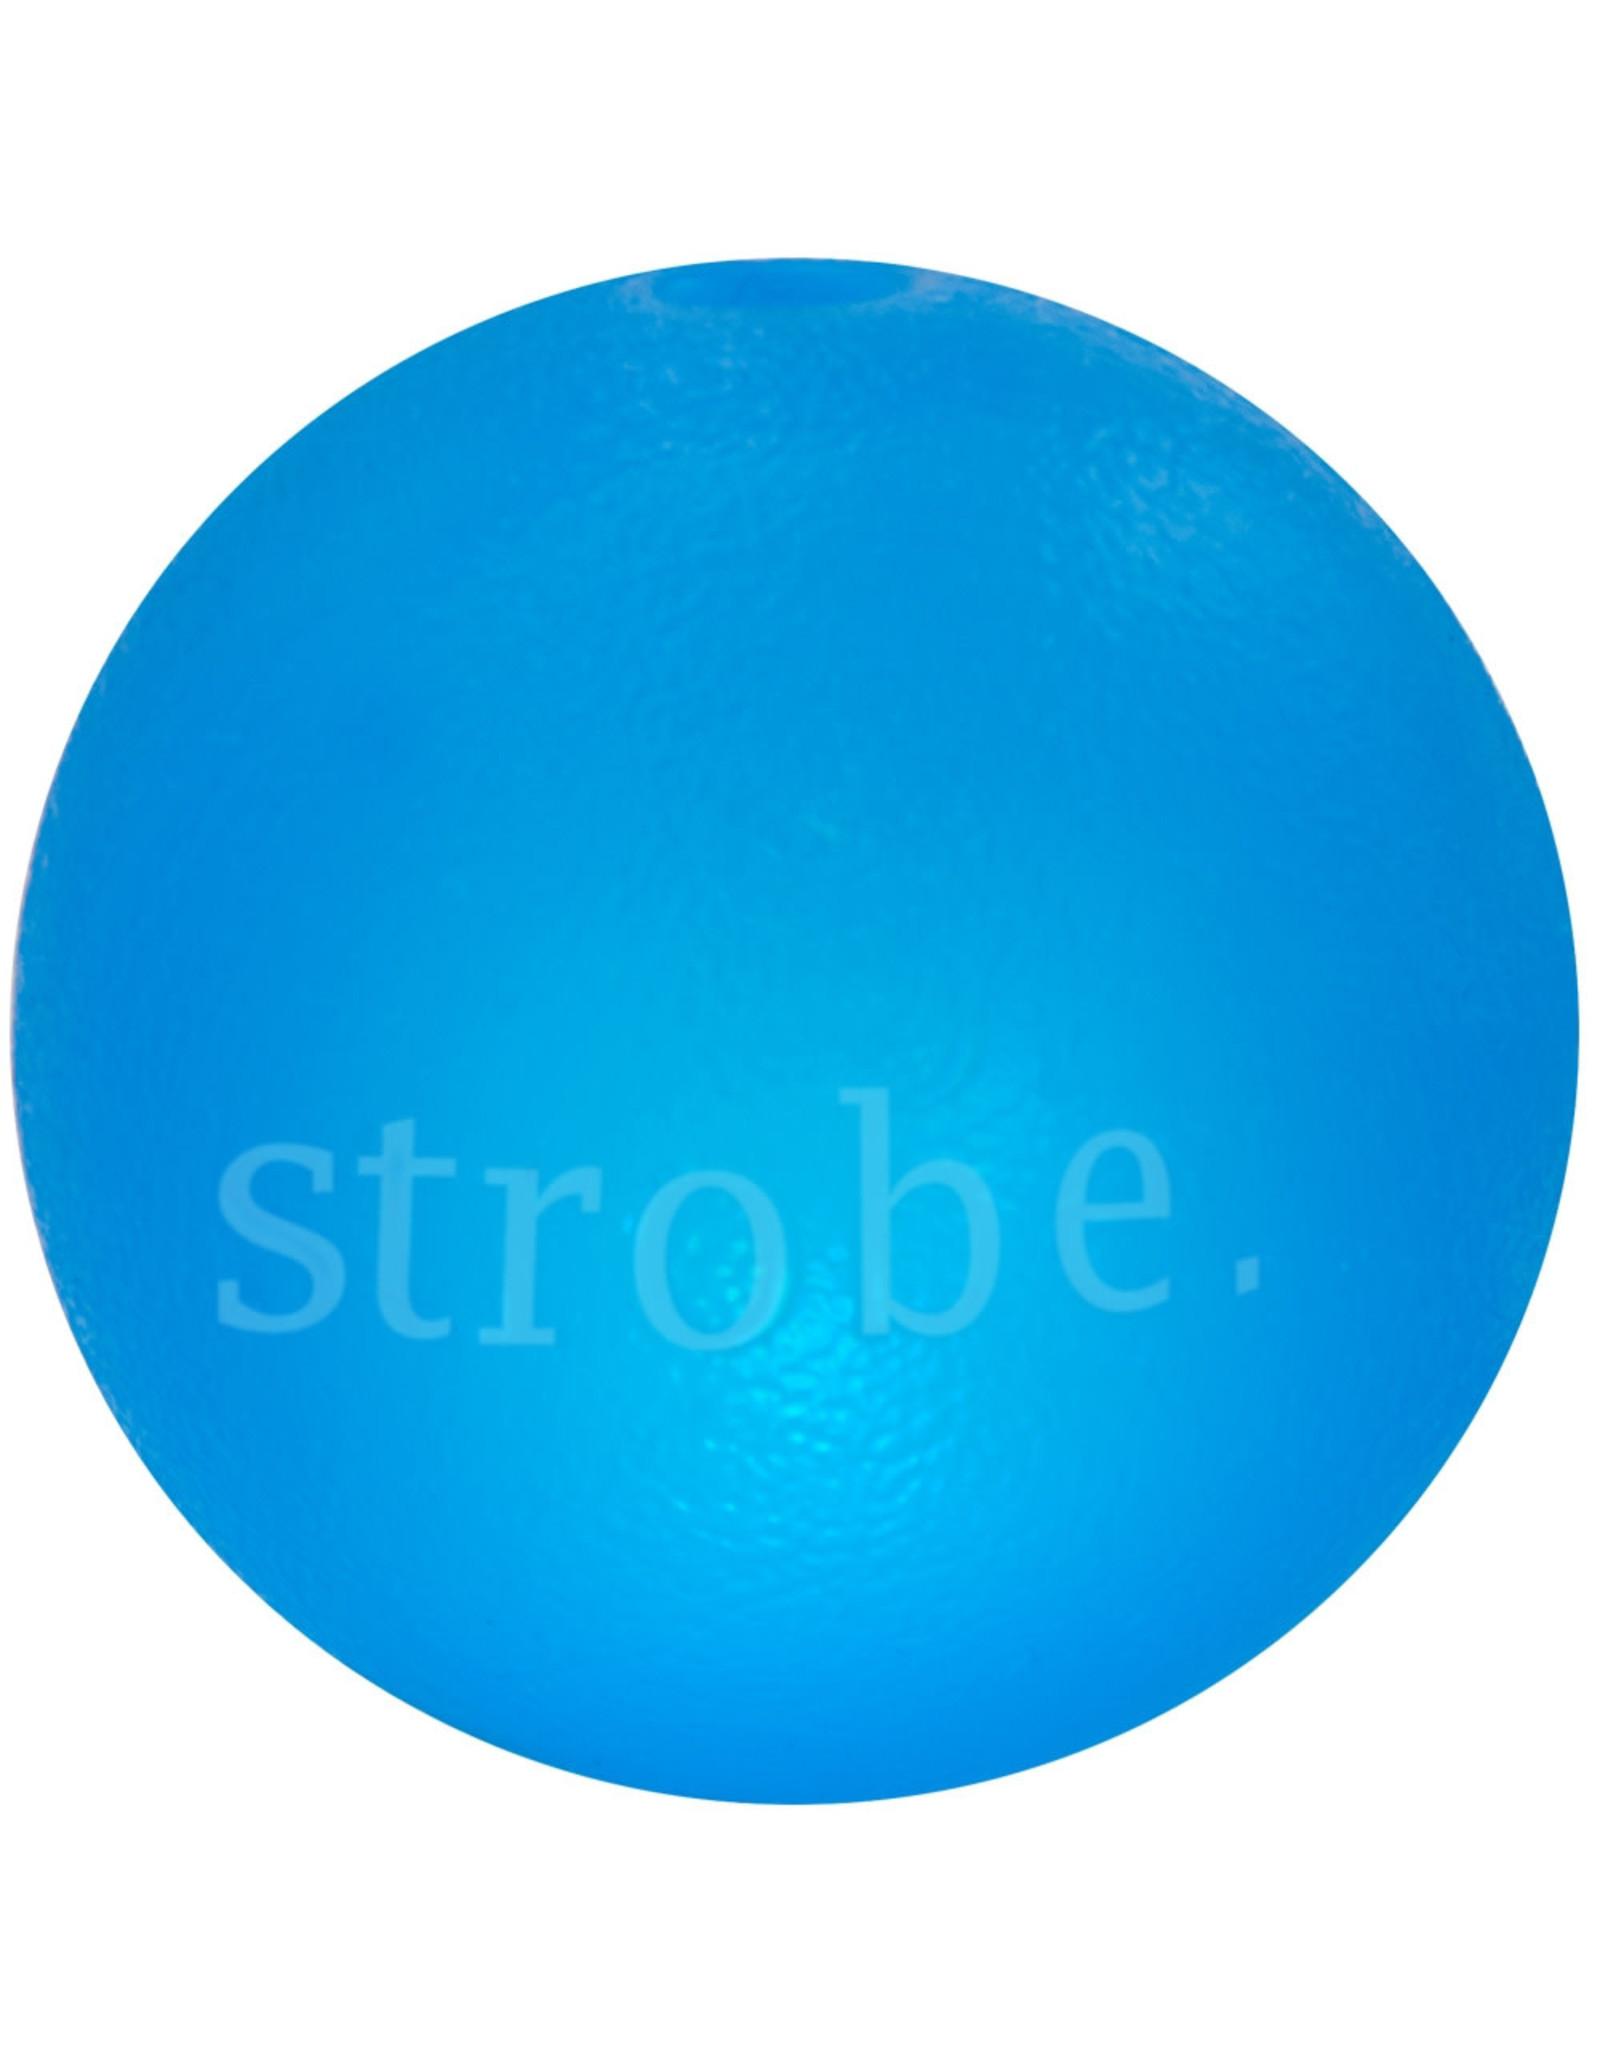 Planet Dog Planet Dog Orbee-Tuff Strobe: Blue, 3 in